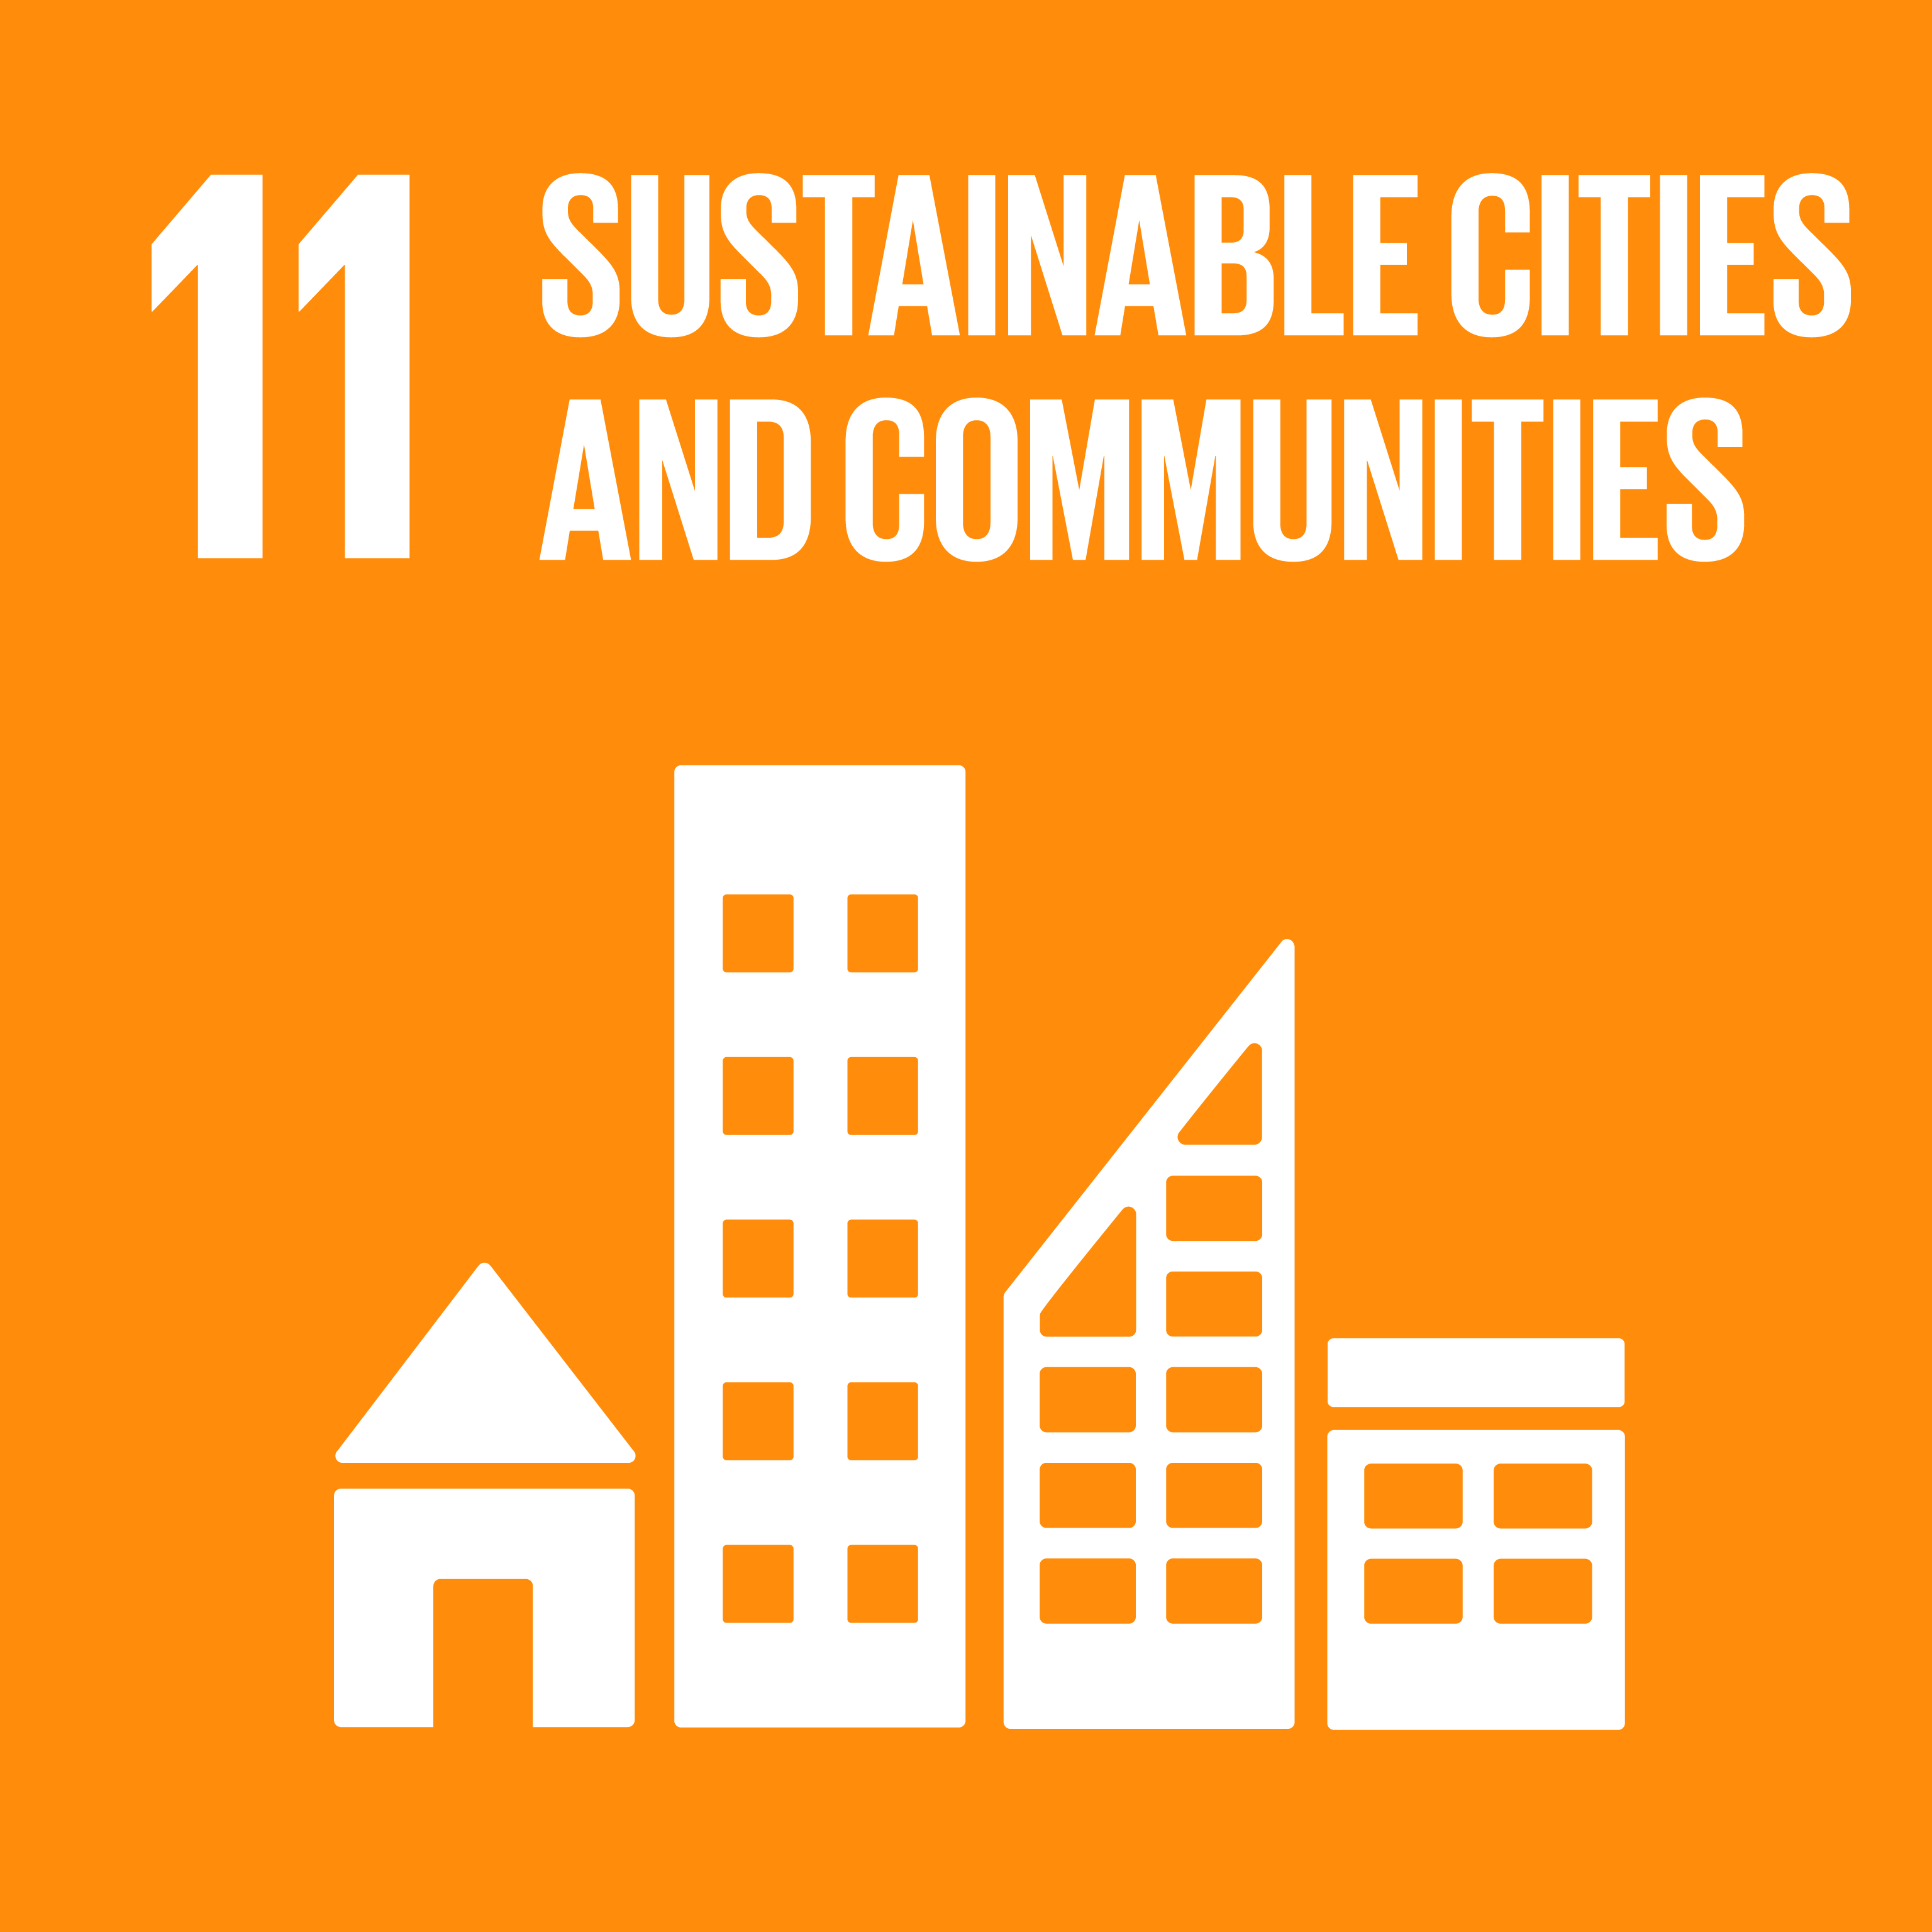 SDG icon 11